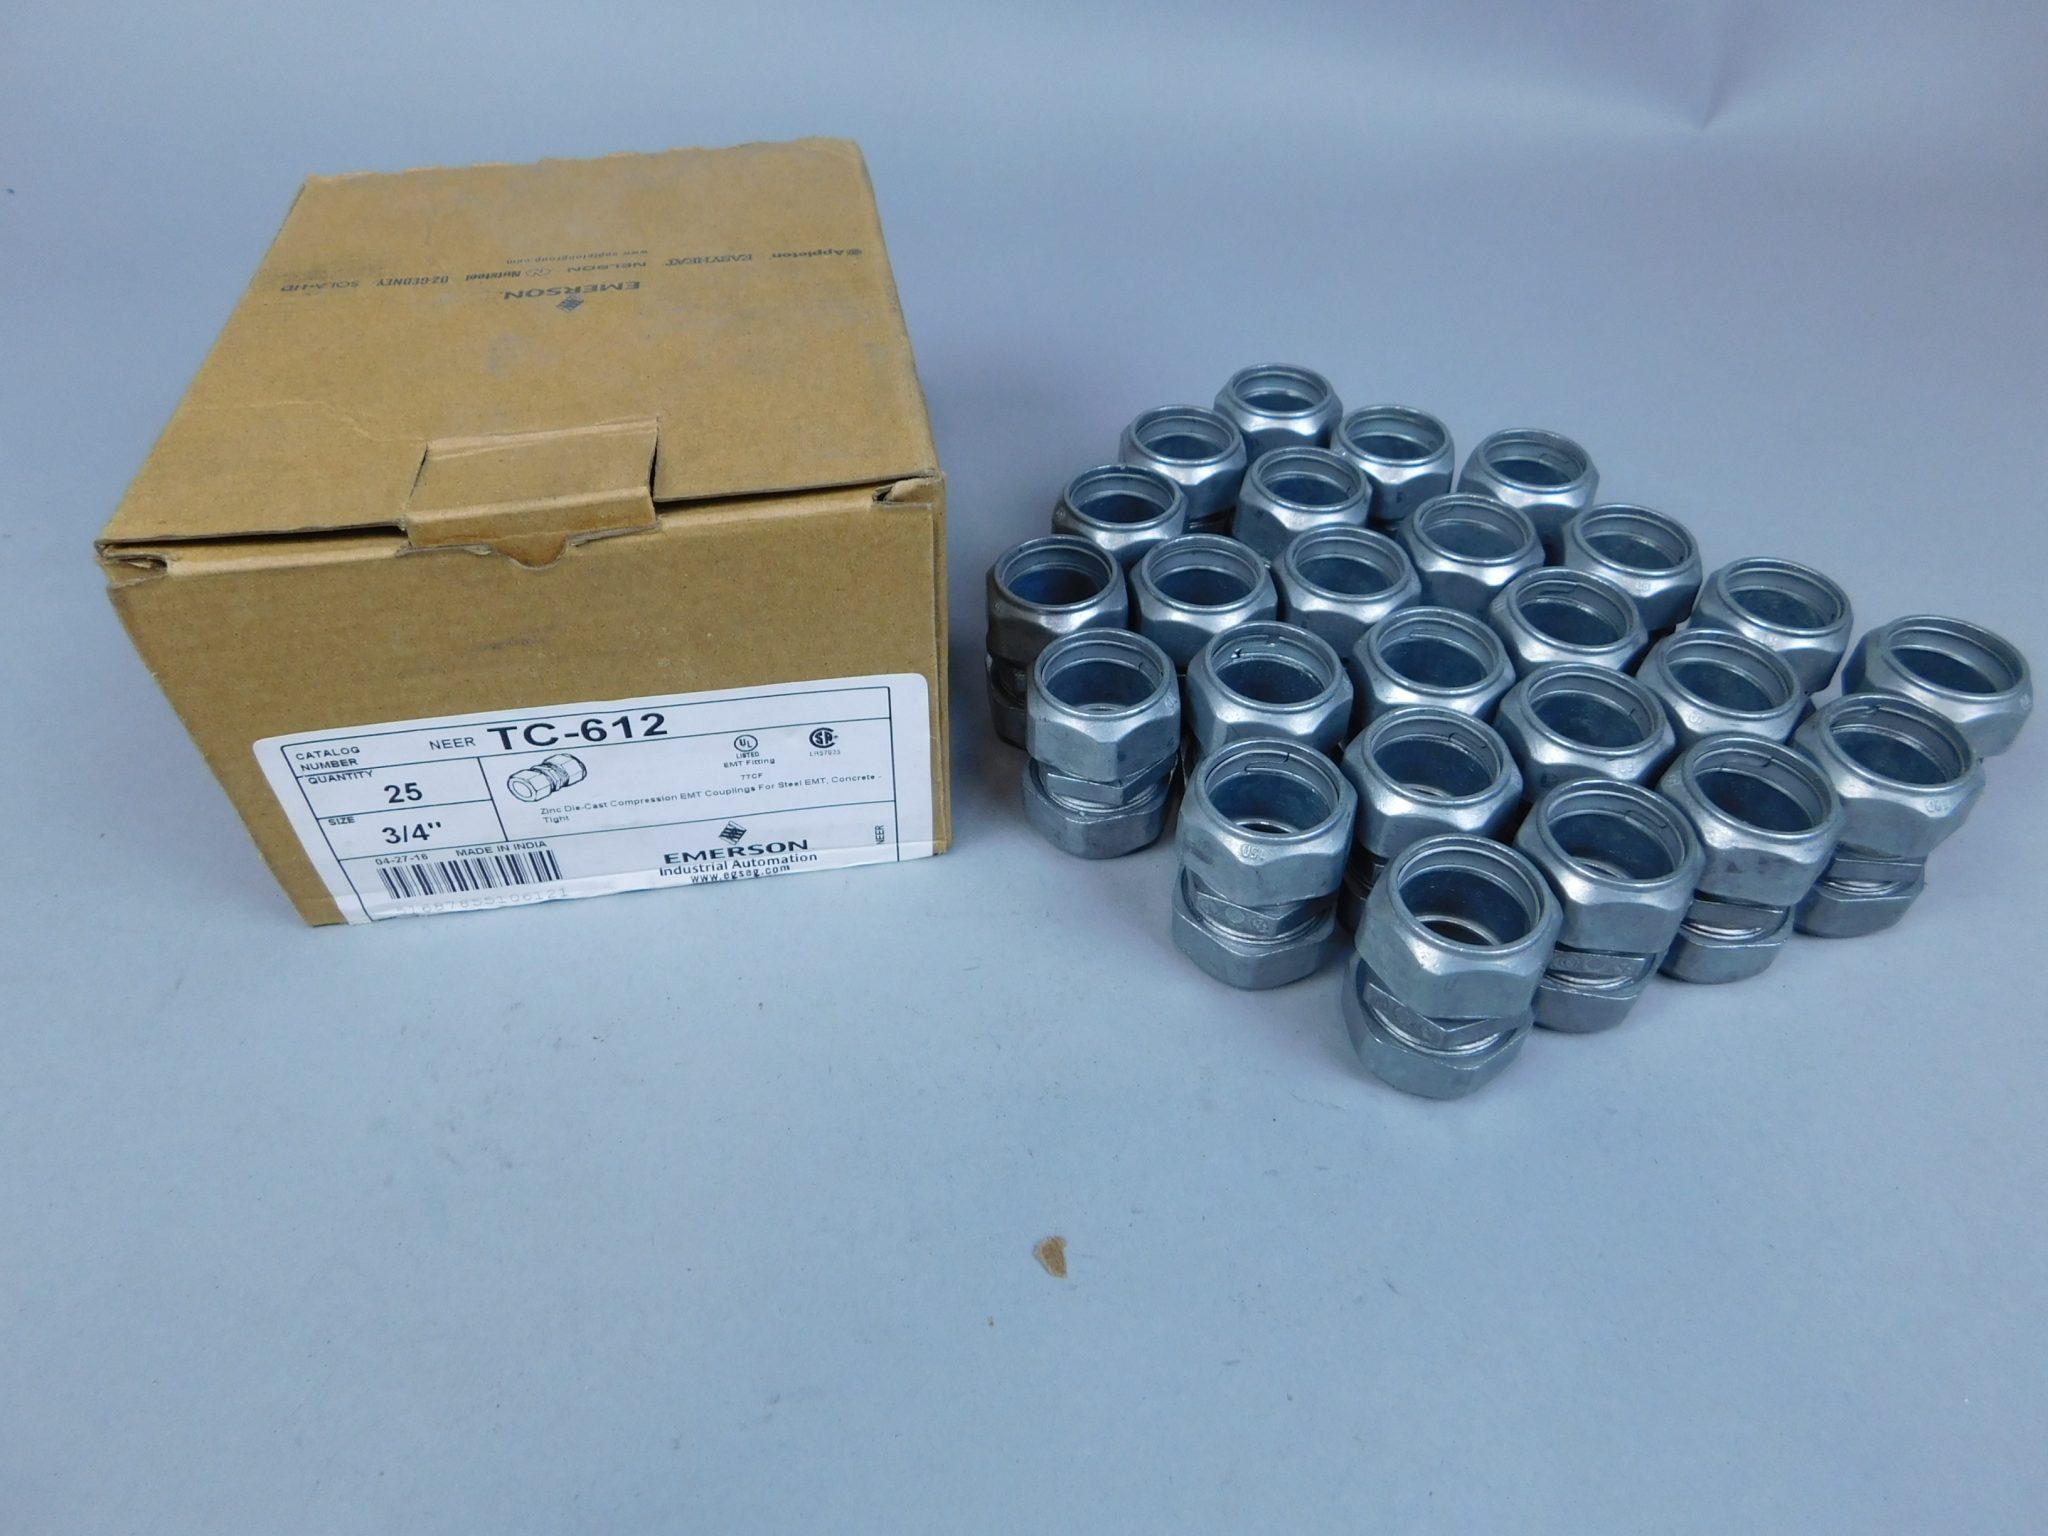 Nichicon Muse FG  Fine Gold  UFG1J330MPM 33uF 63V  8x11,5mm  RM3,5  #BP 4 pcs